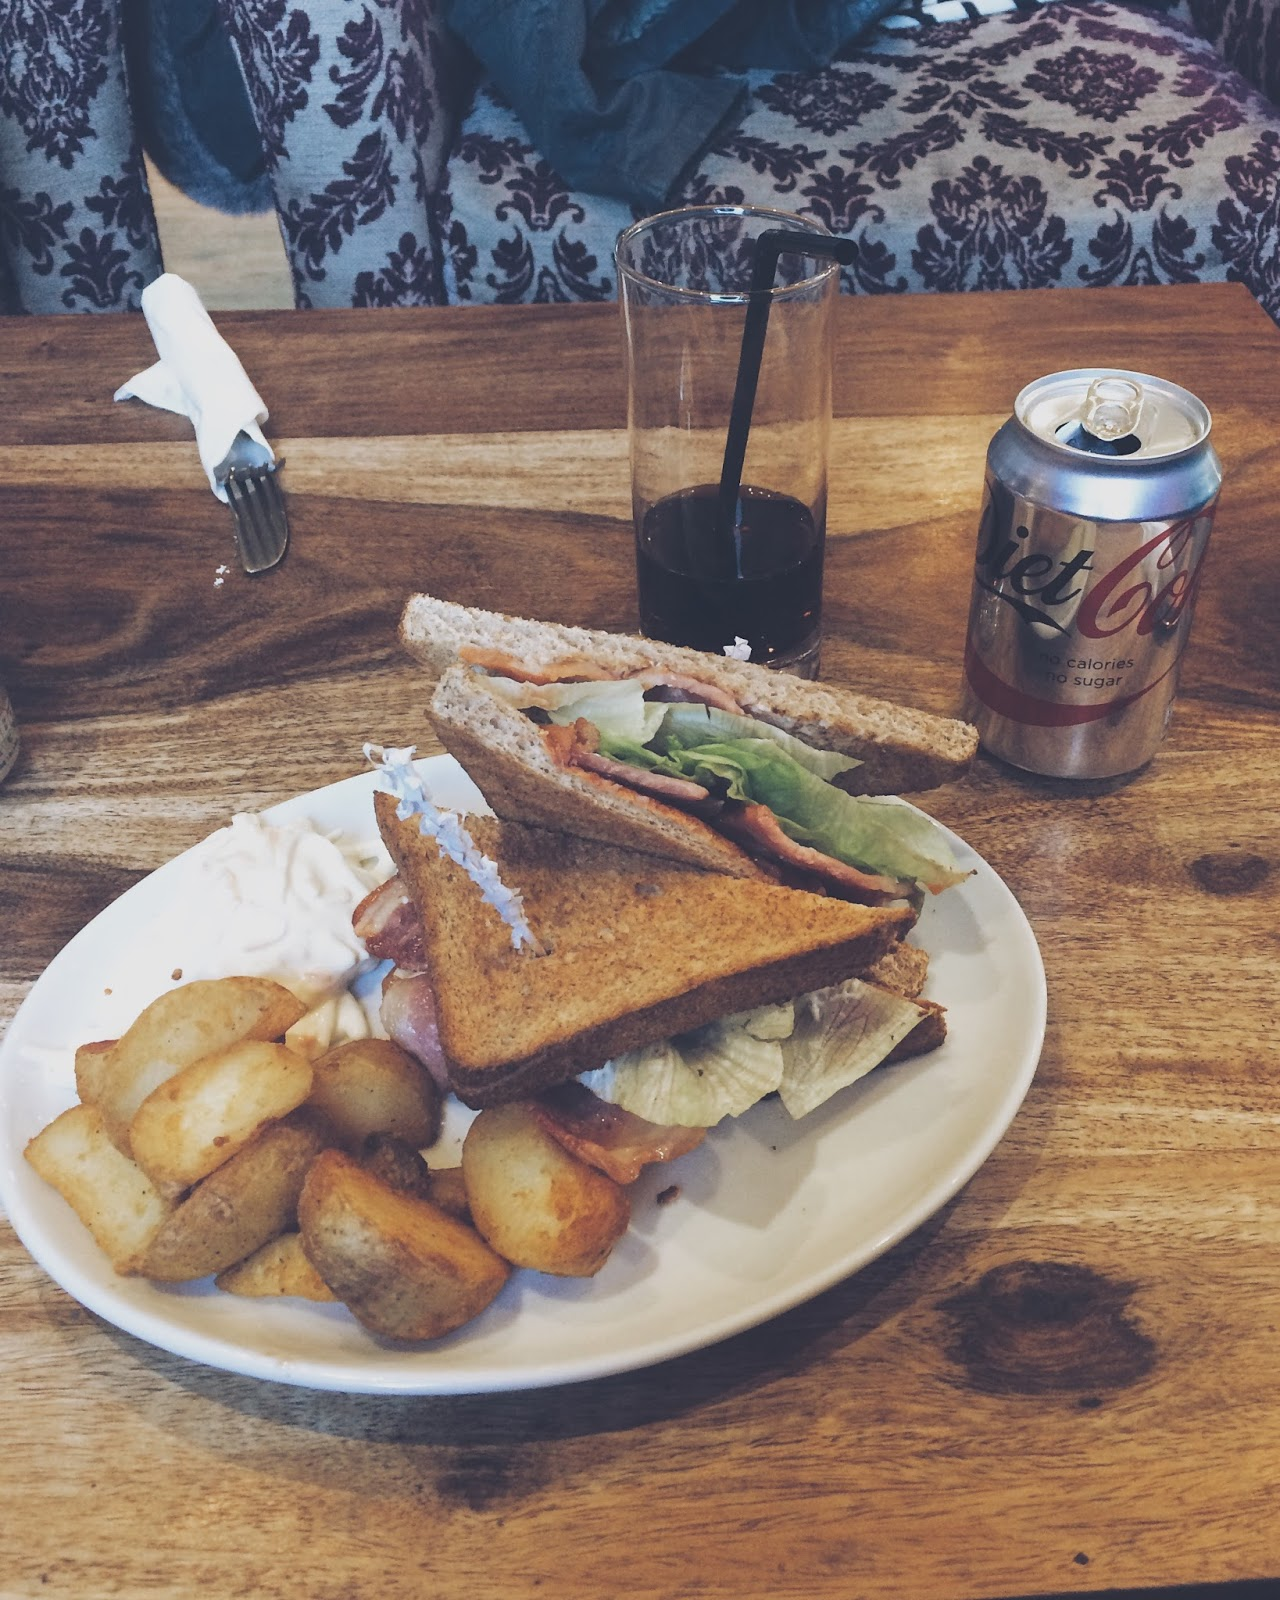 blt, toasted sandwich, bernies blt,bridge of weir, scottish village, bernies cafe deli, scottish cafe, scottish countryside, scottish brunch, scotland, scottish food, scottish restaurant, scottish food, local food, scottish deli, deli, bridge of weir deli, bridge of weir cafe,